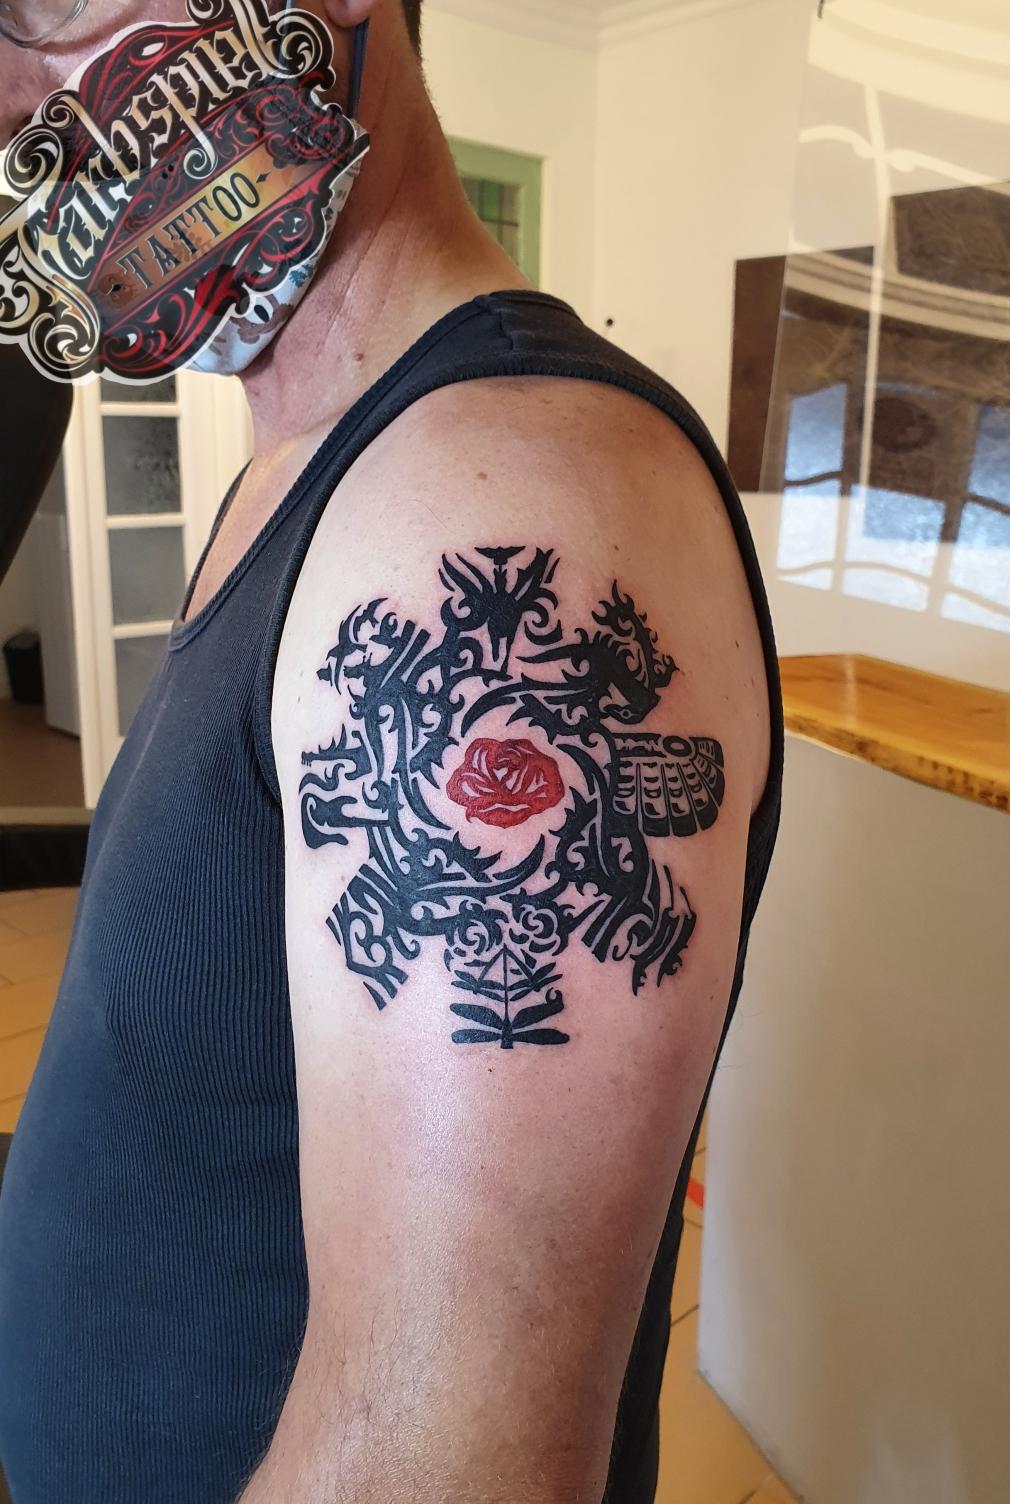 Redhotchillipeppers tattoo